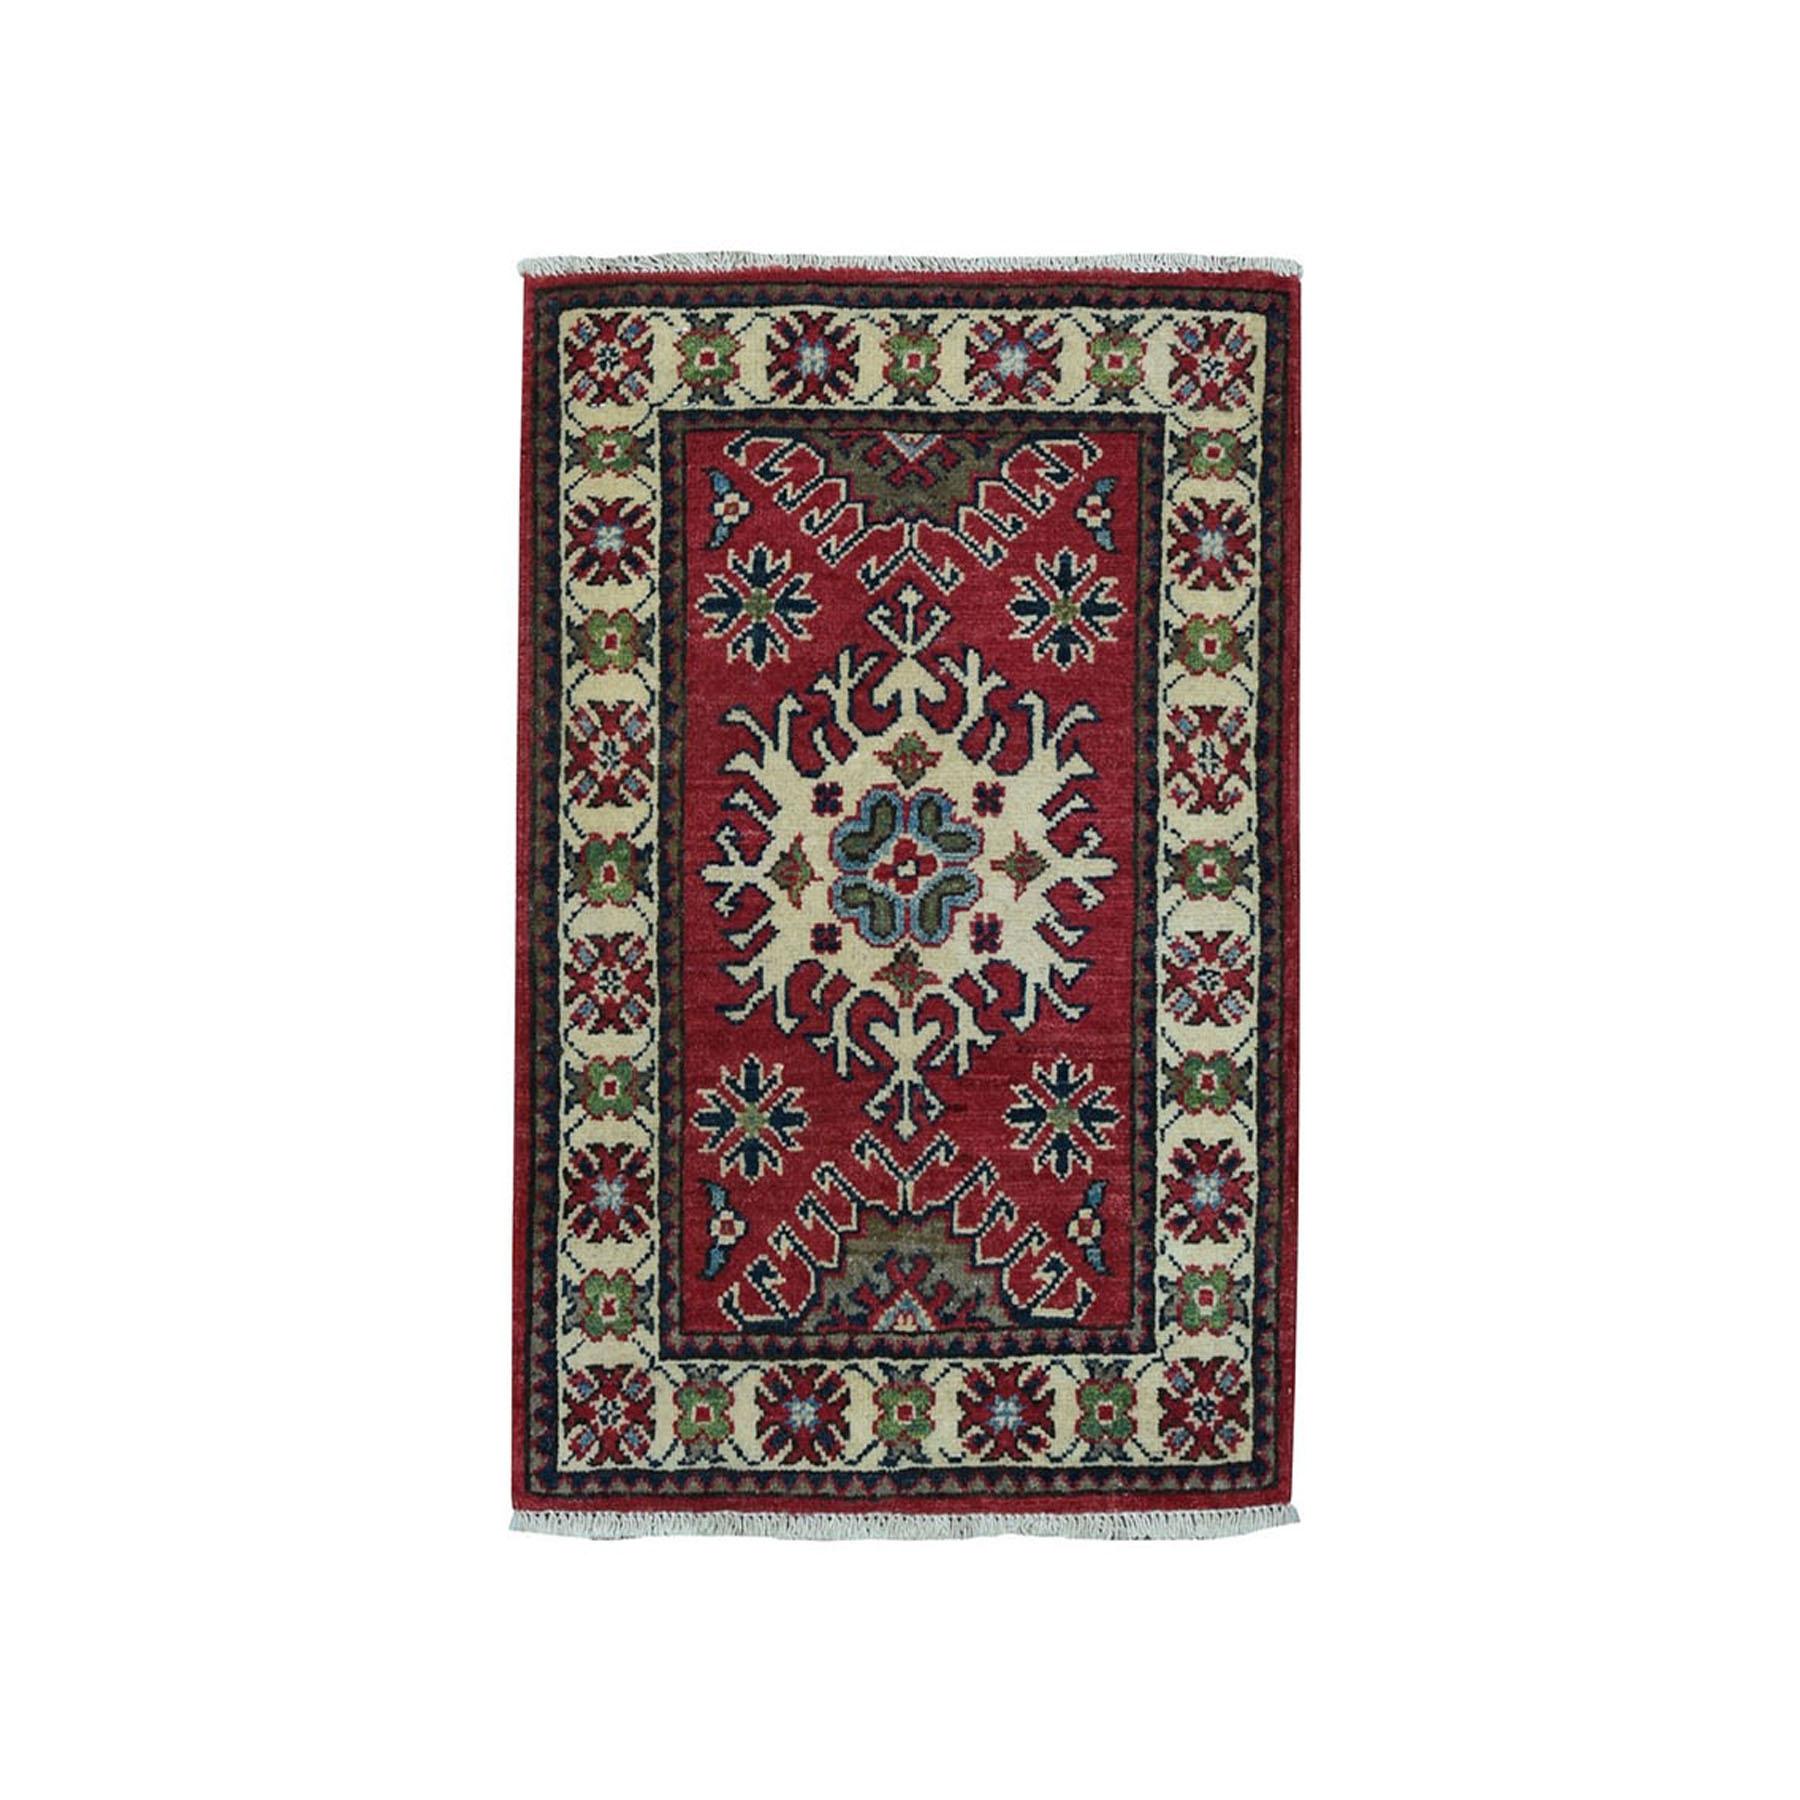 2'X3' Red Geometric Design Kazak Pure Wool Hand-Knotted Oriental Rug moae0999